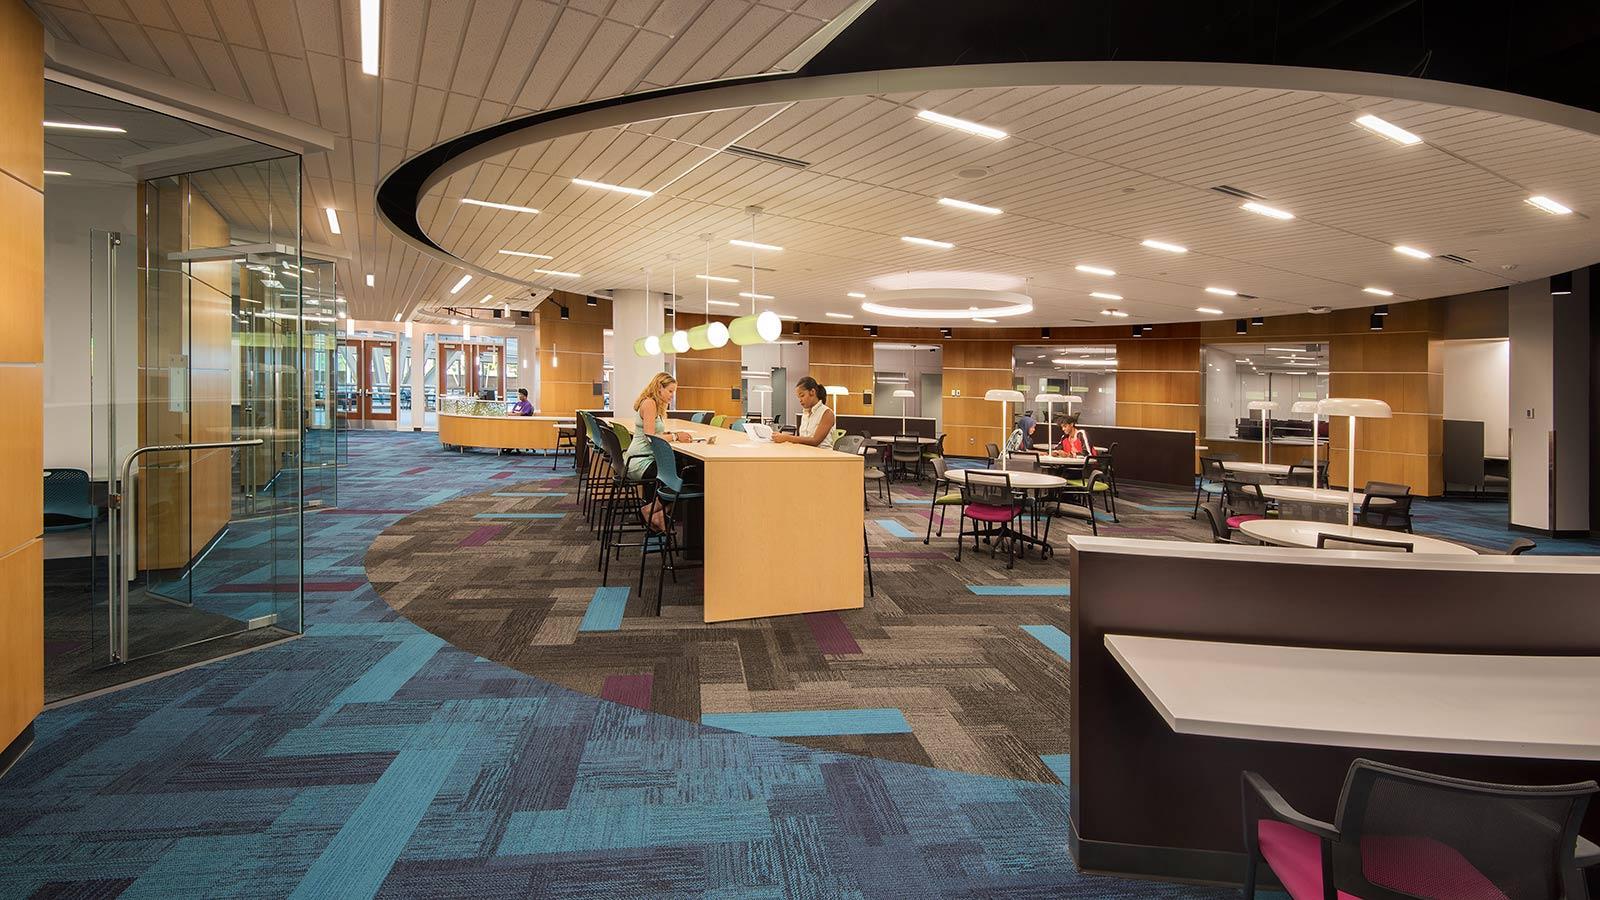 Inside the Academic Success Center Main Area